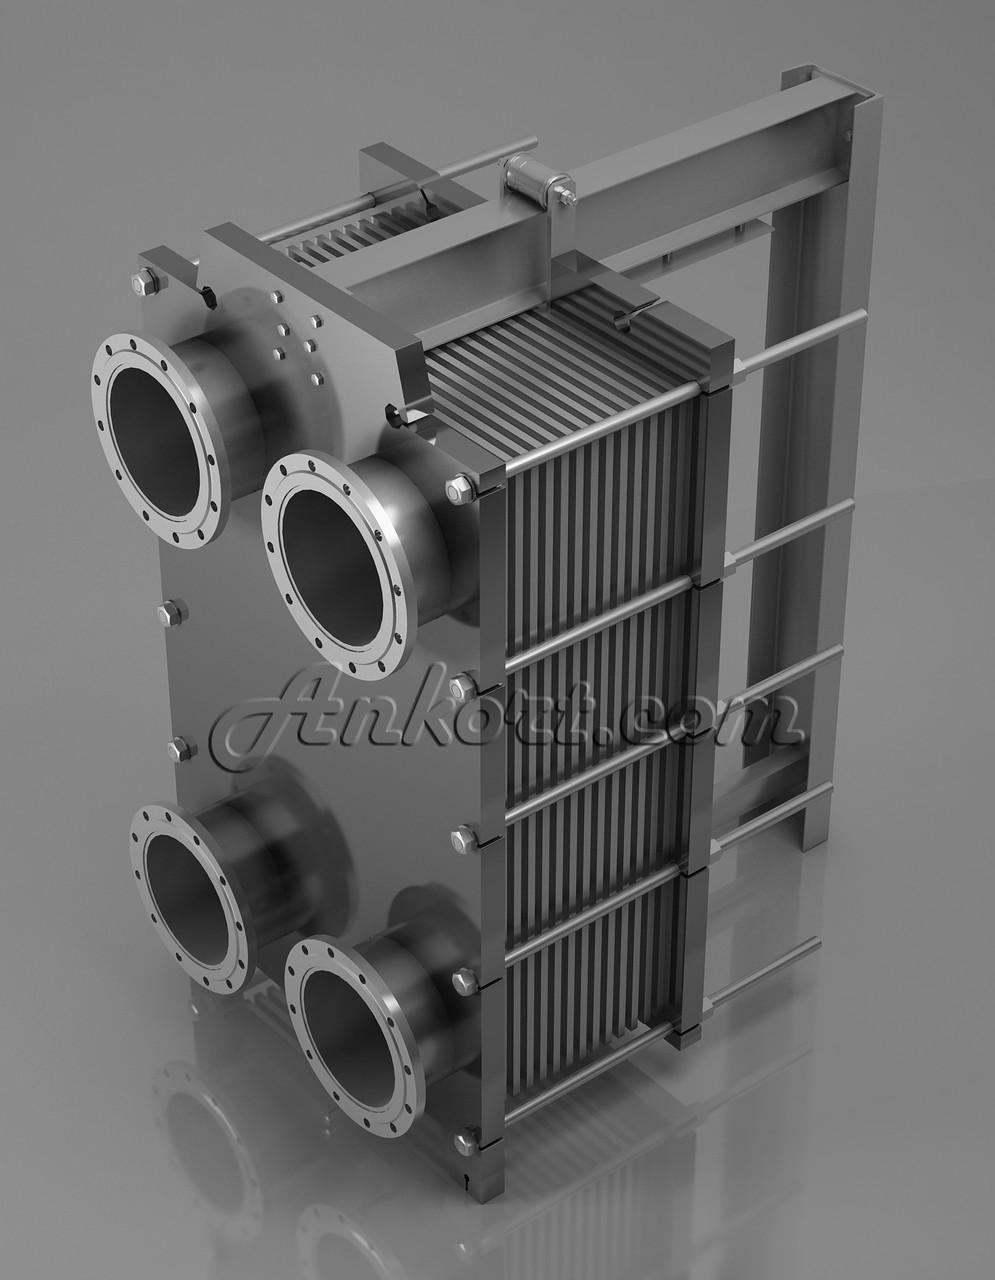 Теплообменники анкор отзывы Паяный теплообменник Alfa Laval CB30AQ-34H Северск